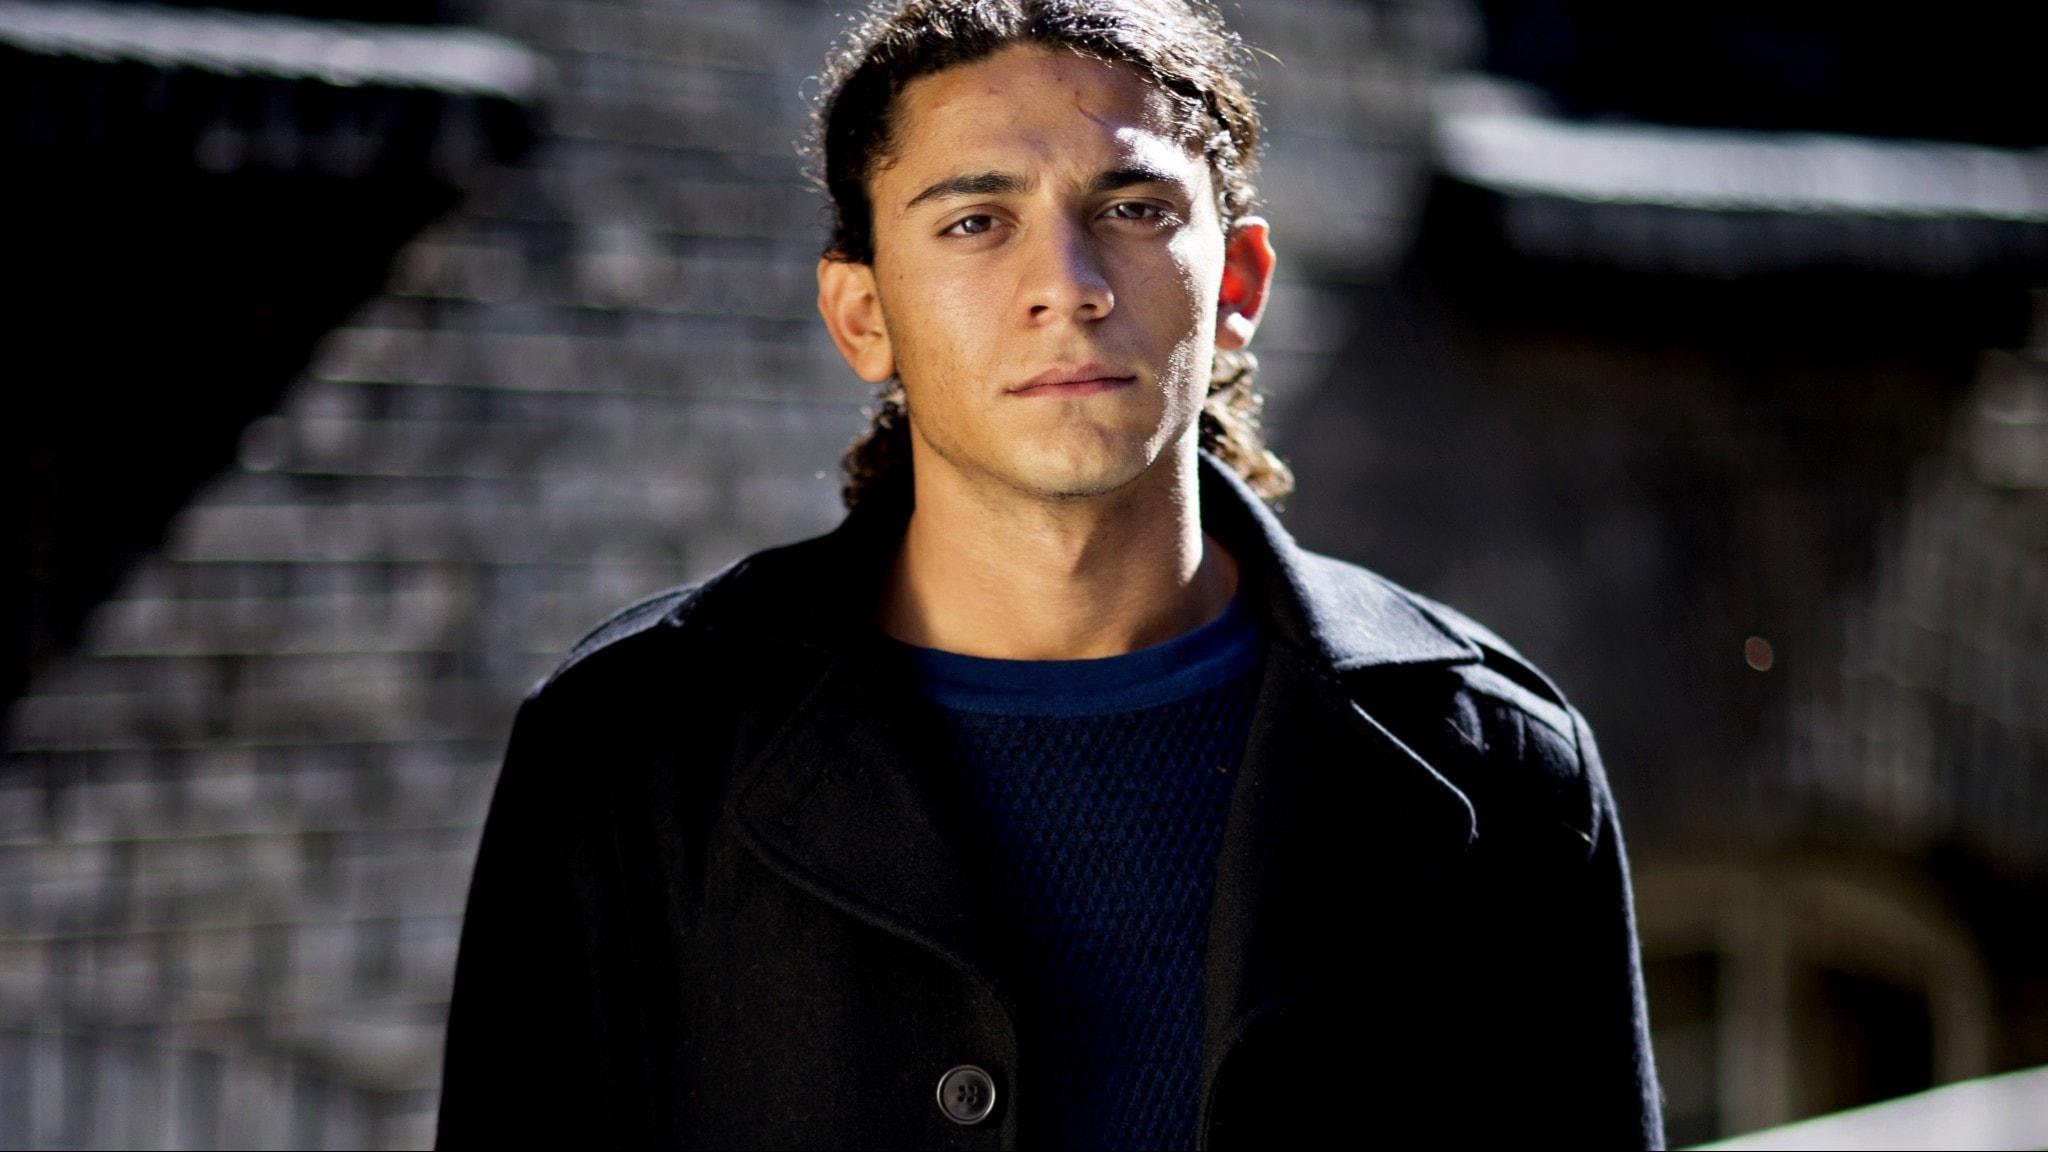 Yahya Hassan